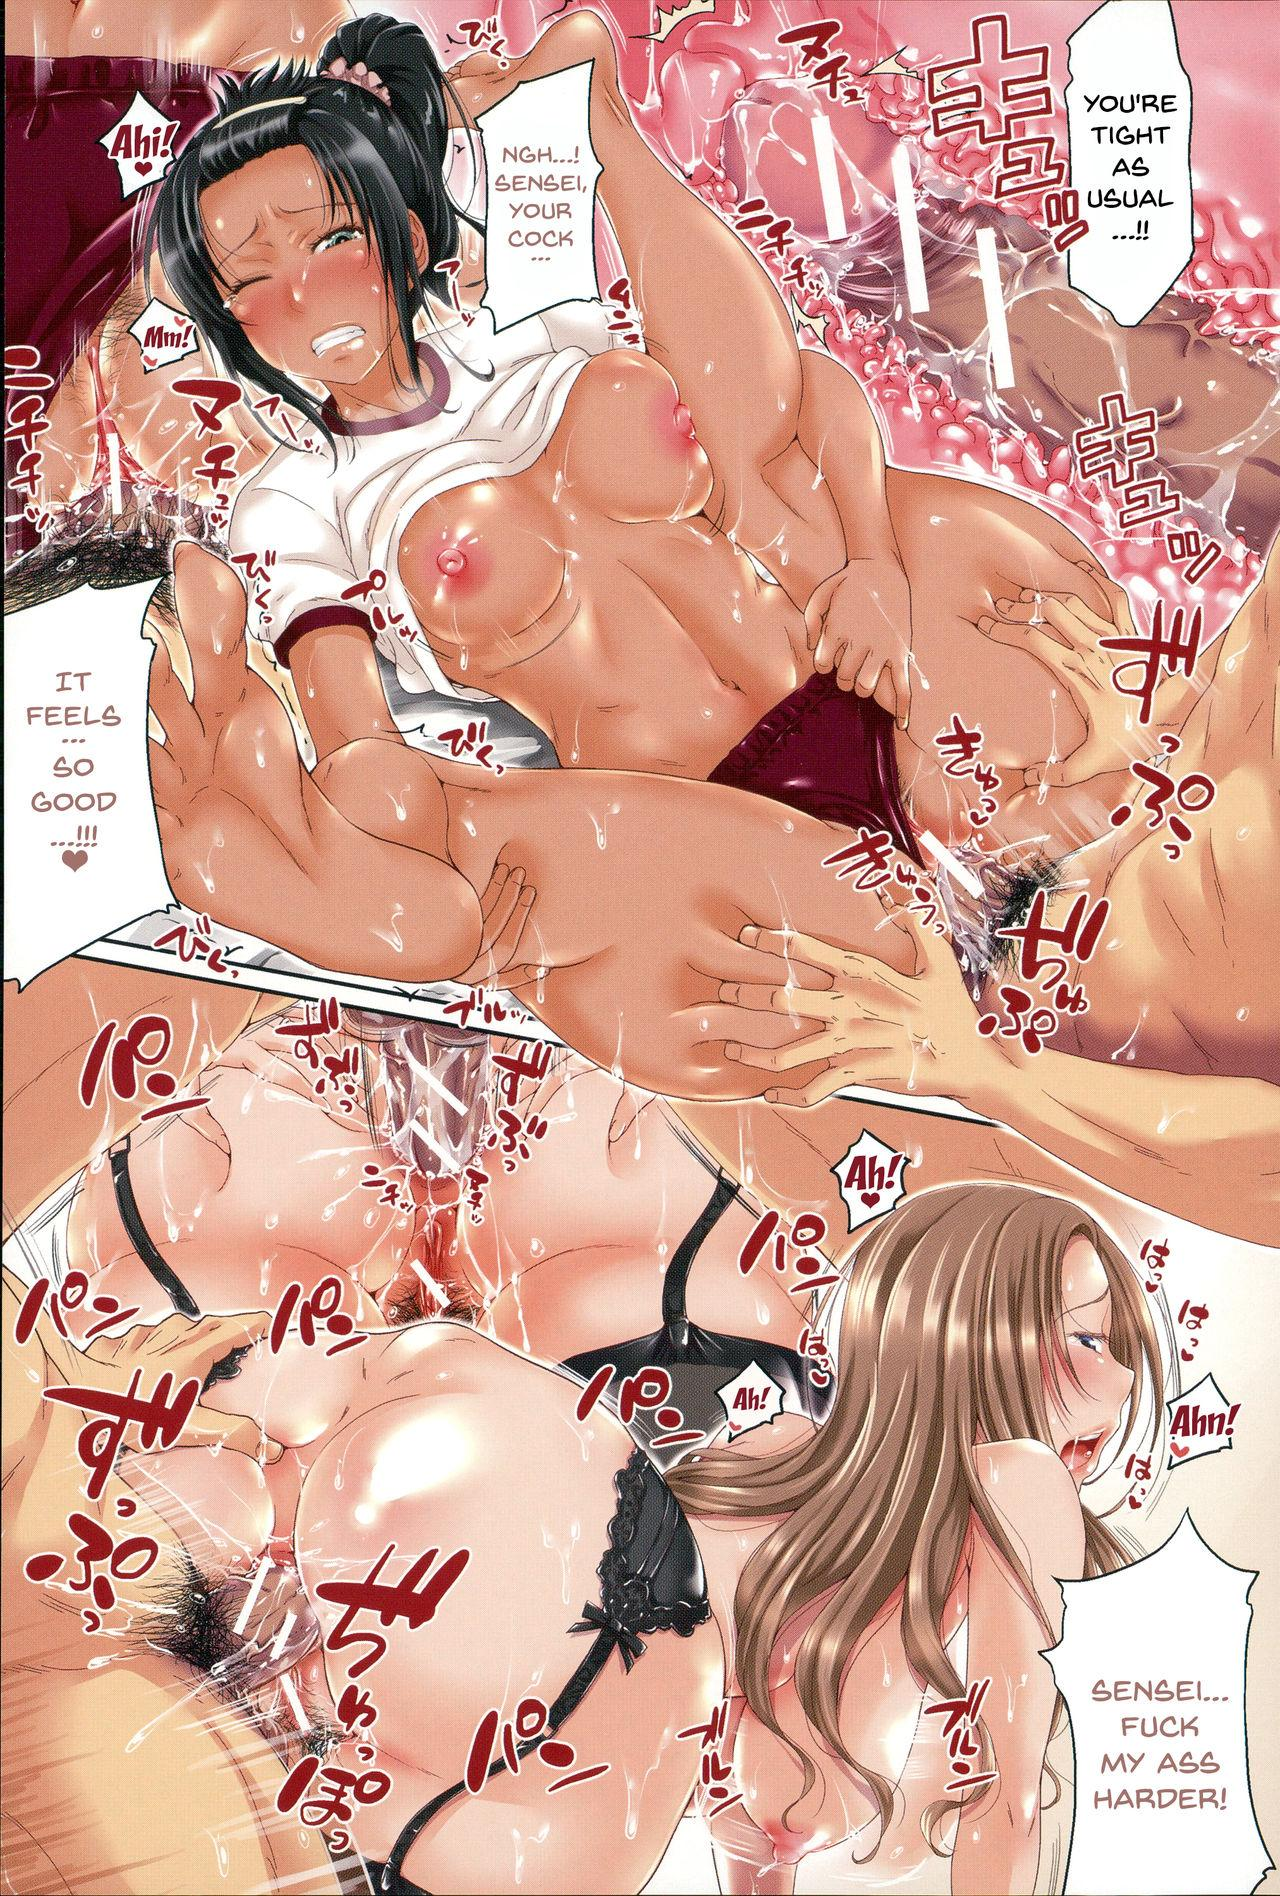 [Takuwan] Pakotate! Seikouritsu 0% no Teppeki Bishojo VS Seikouritsu 100% no Hentai Katei Kyoushi   Pakotate! Sex Rate 0% Iron-Willed Beautiful Virgins VS Sex Rate 100% Perverted Coach Ch.1-5 [English] {Doujins.com} 4